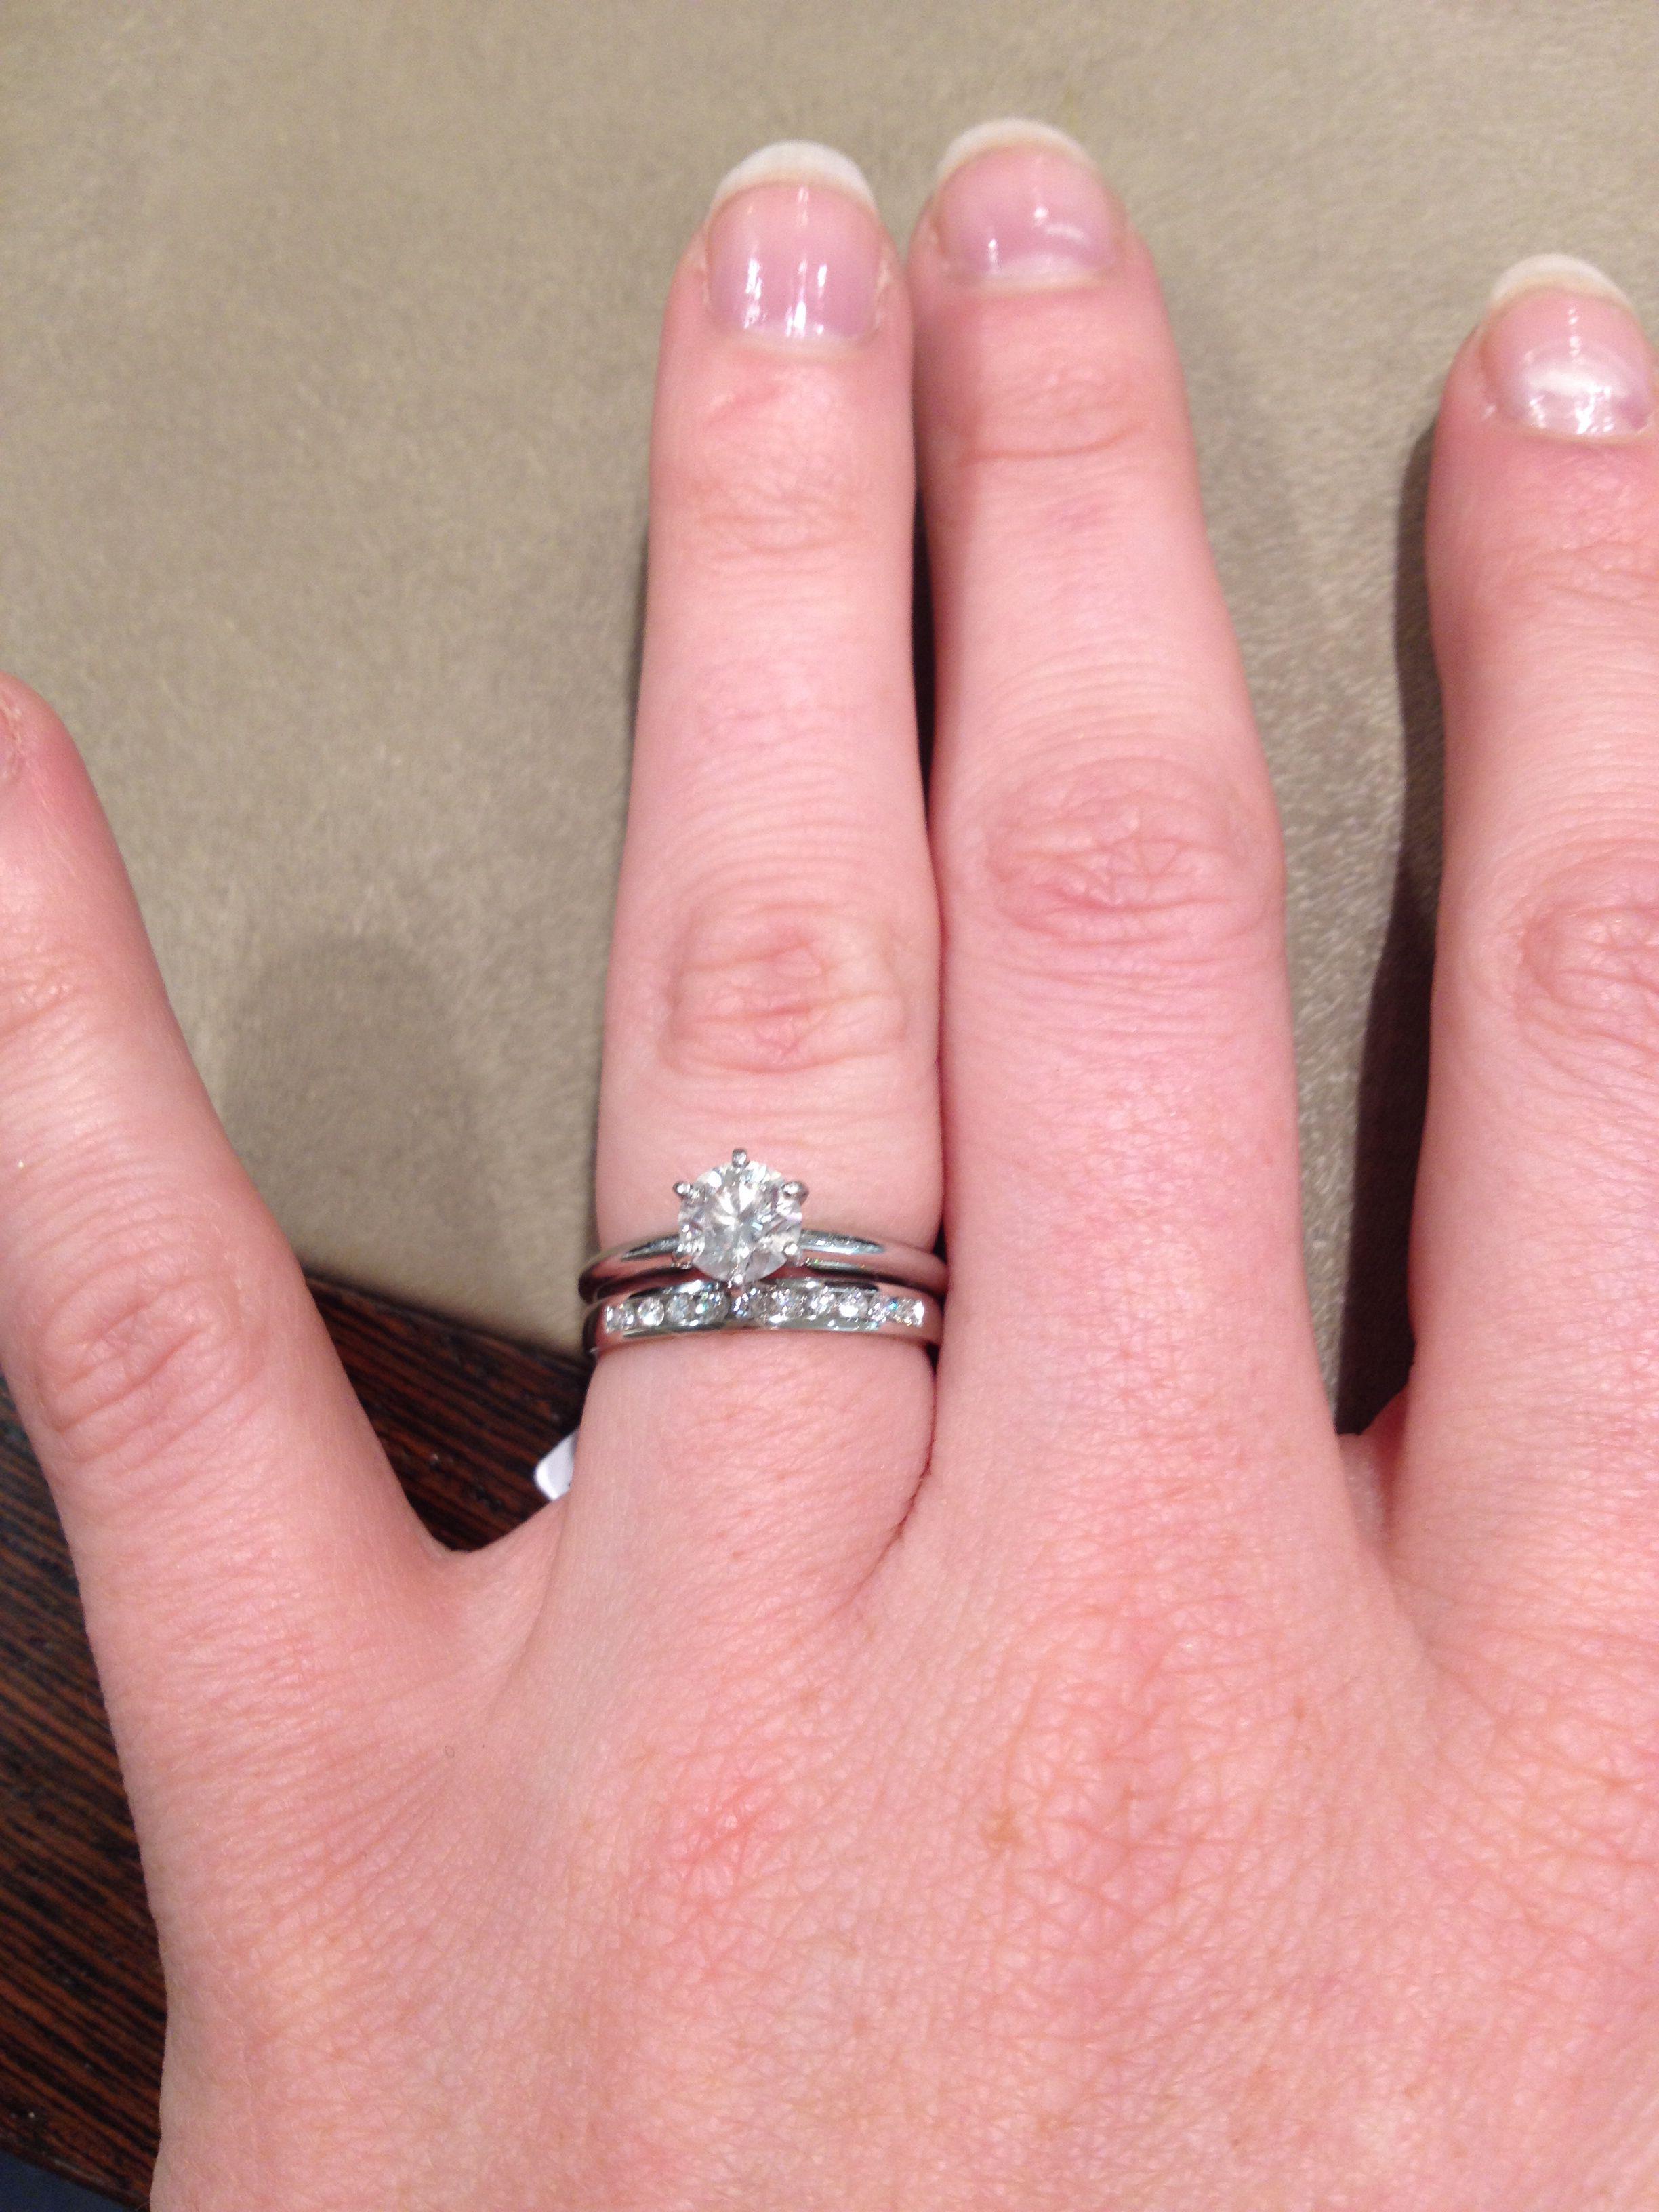 Engagement and wedding band combo - Fraser hart | Wedding jewellery ...